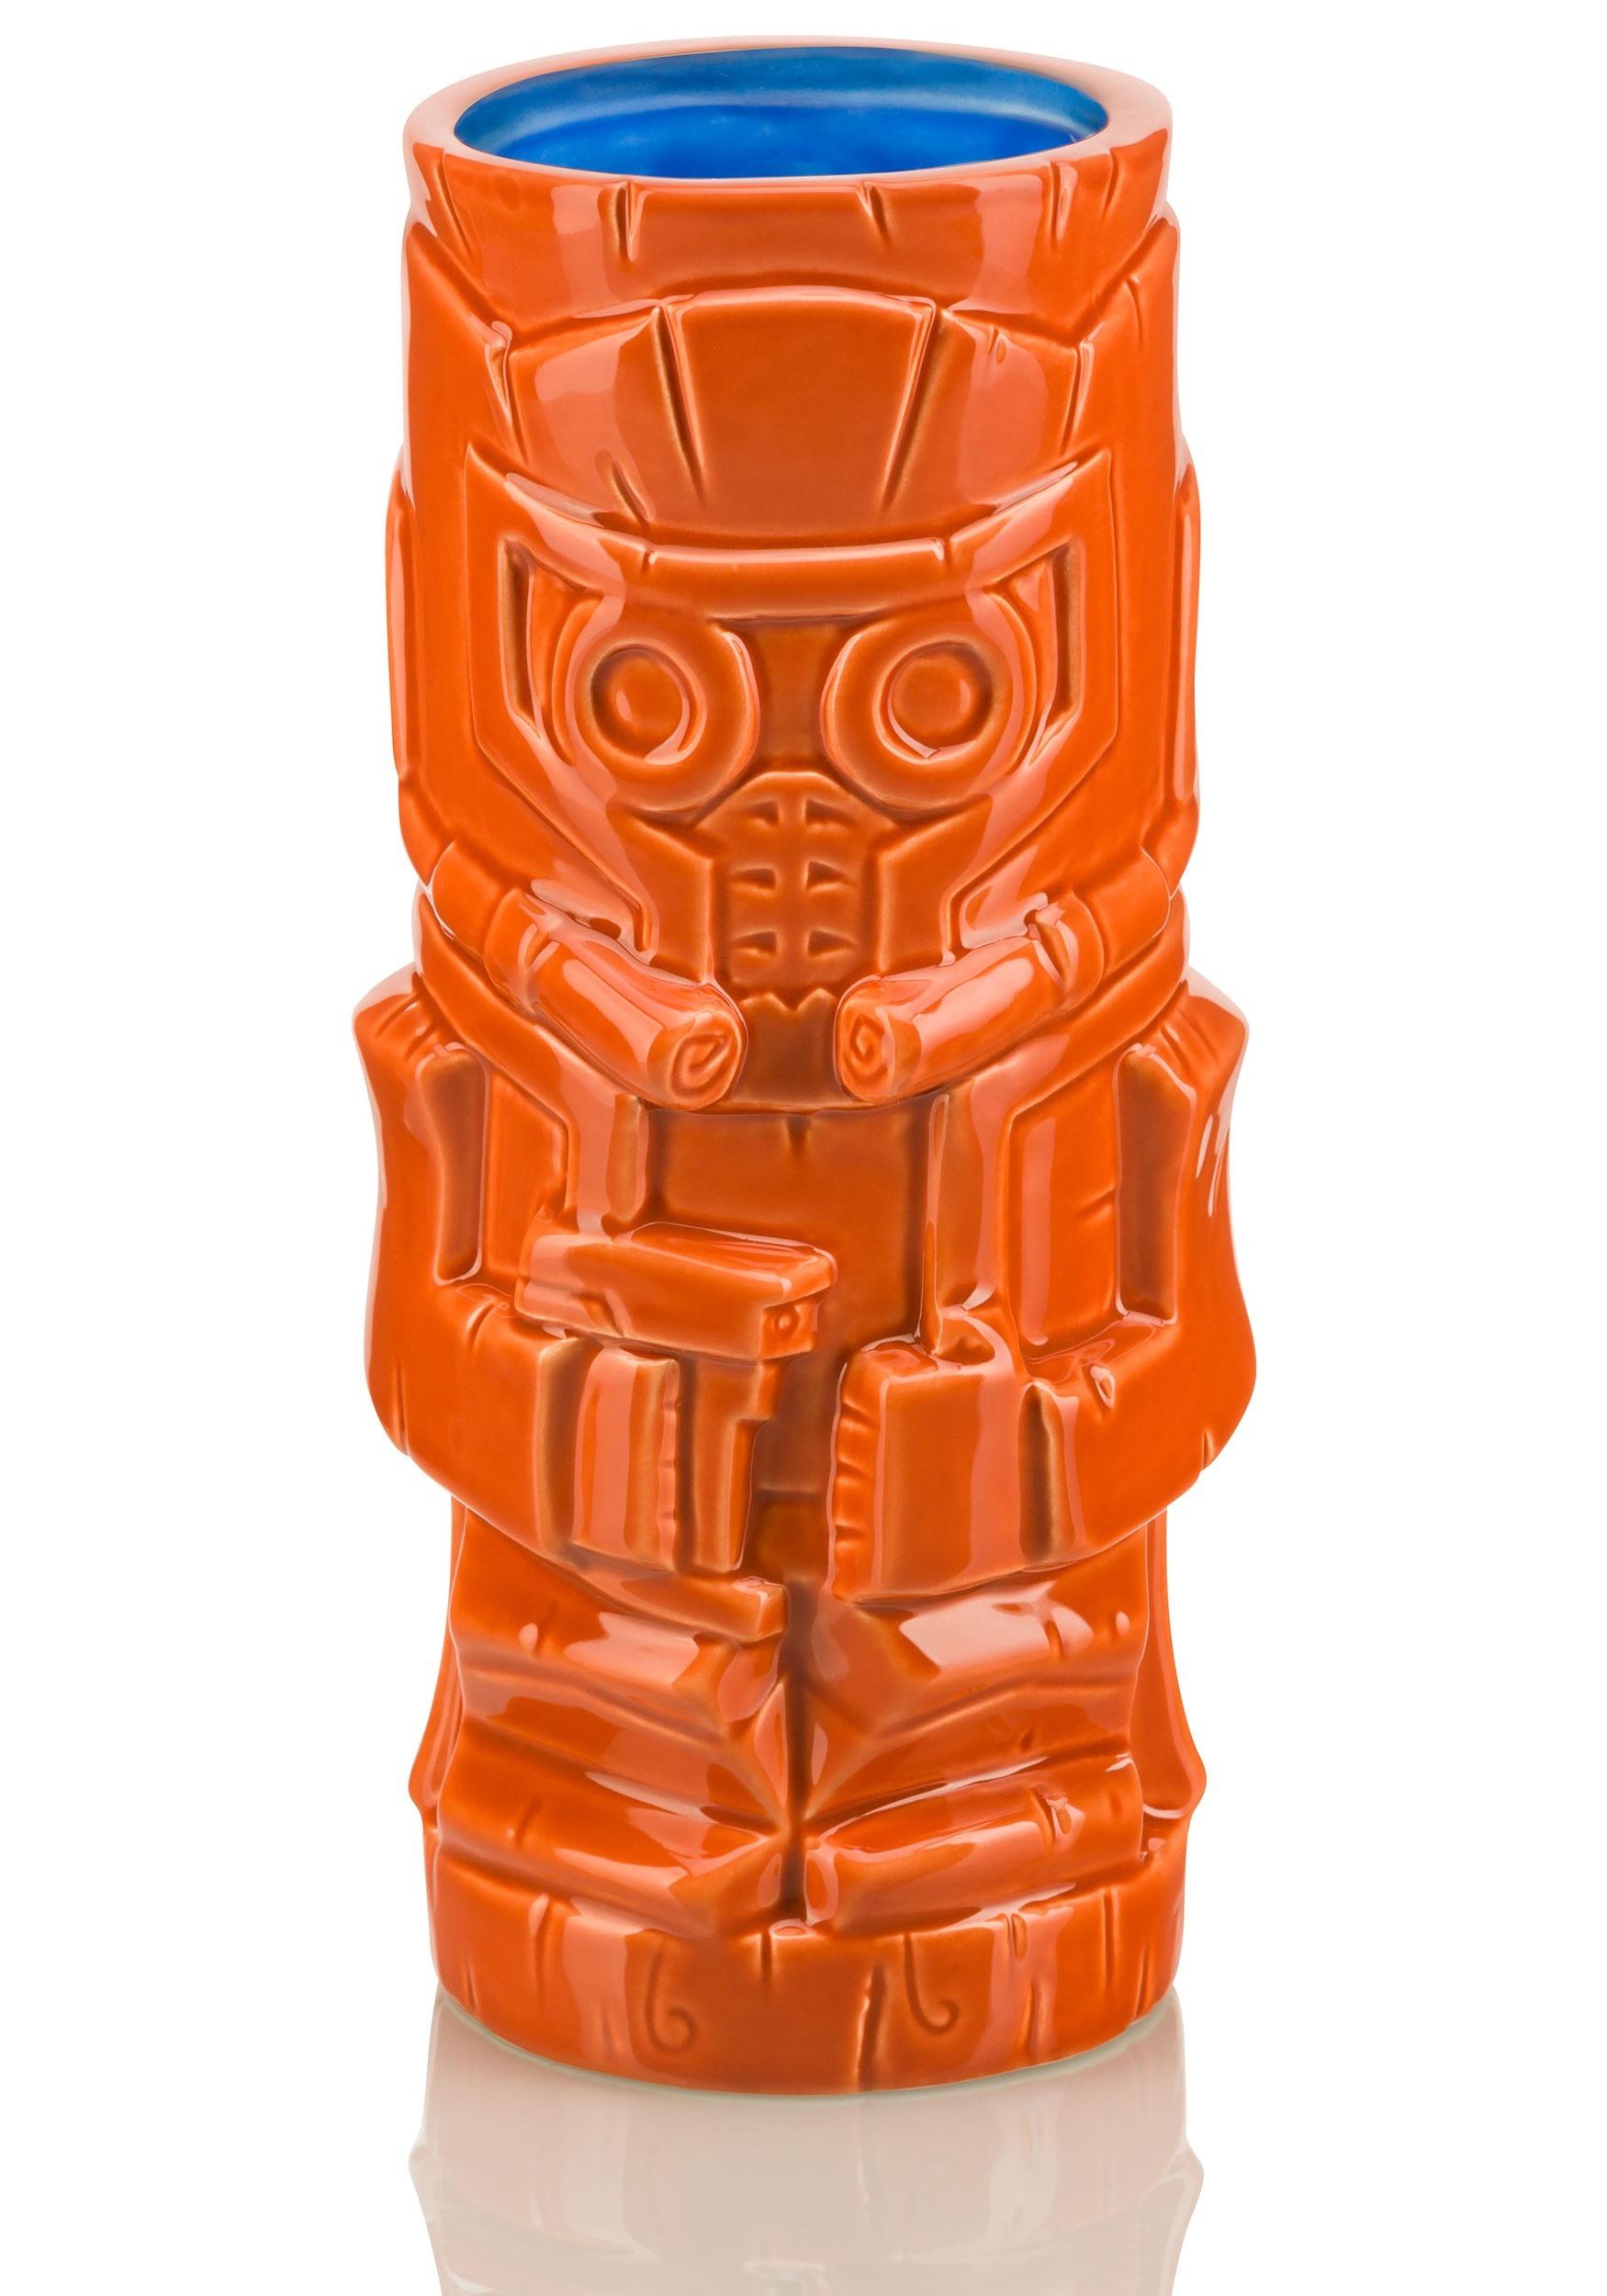 Geeki Tikis Guardians of the Galaxy Star Lord Mug - 14oz